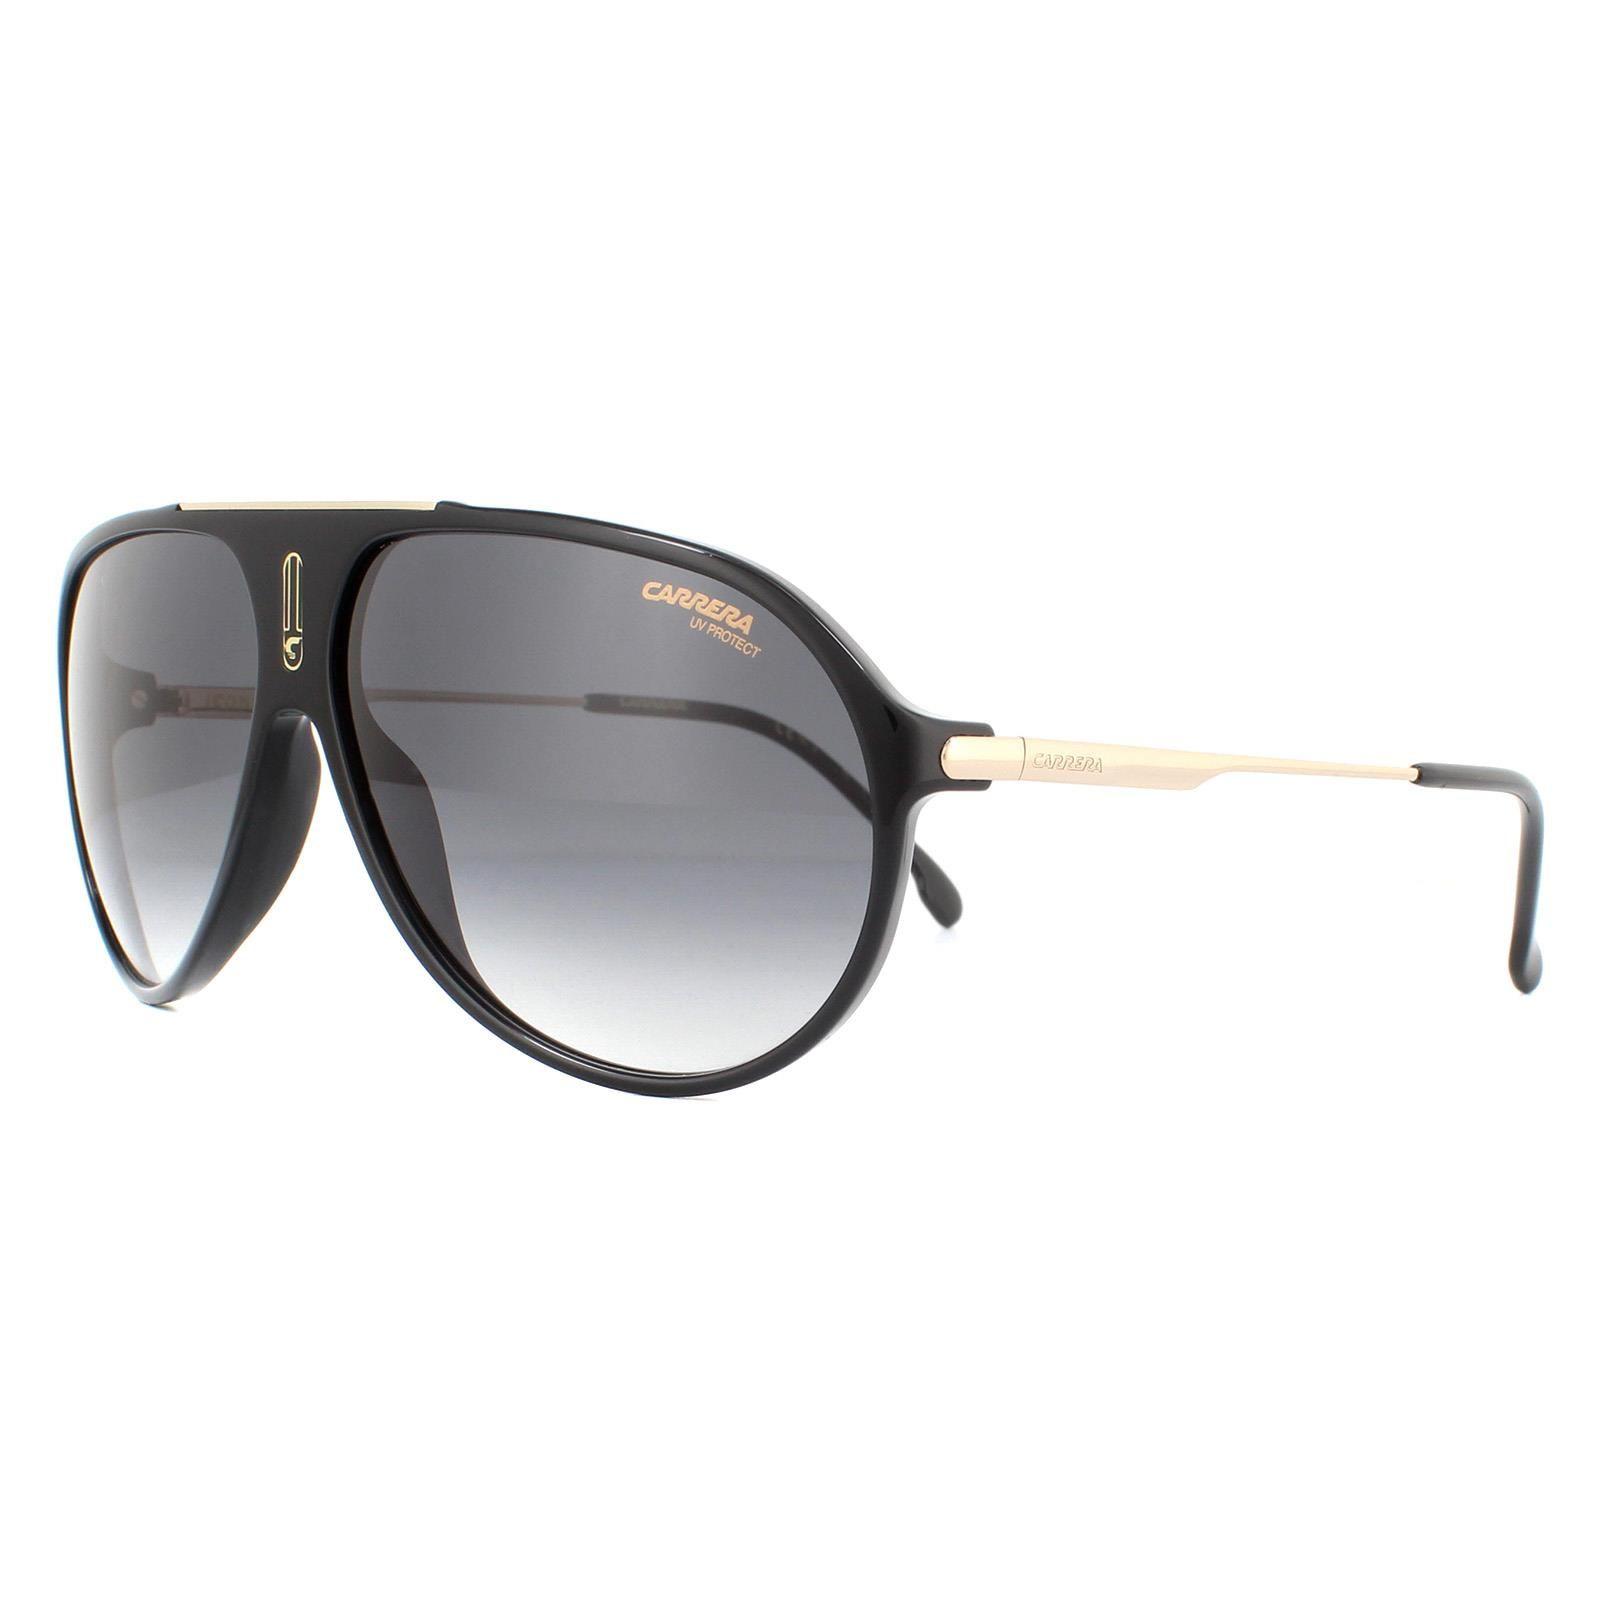 Carrera Sunglasses Hot 65 807/9O Black Dark Grey Gradient